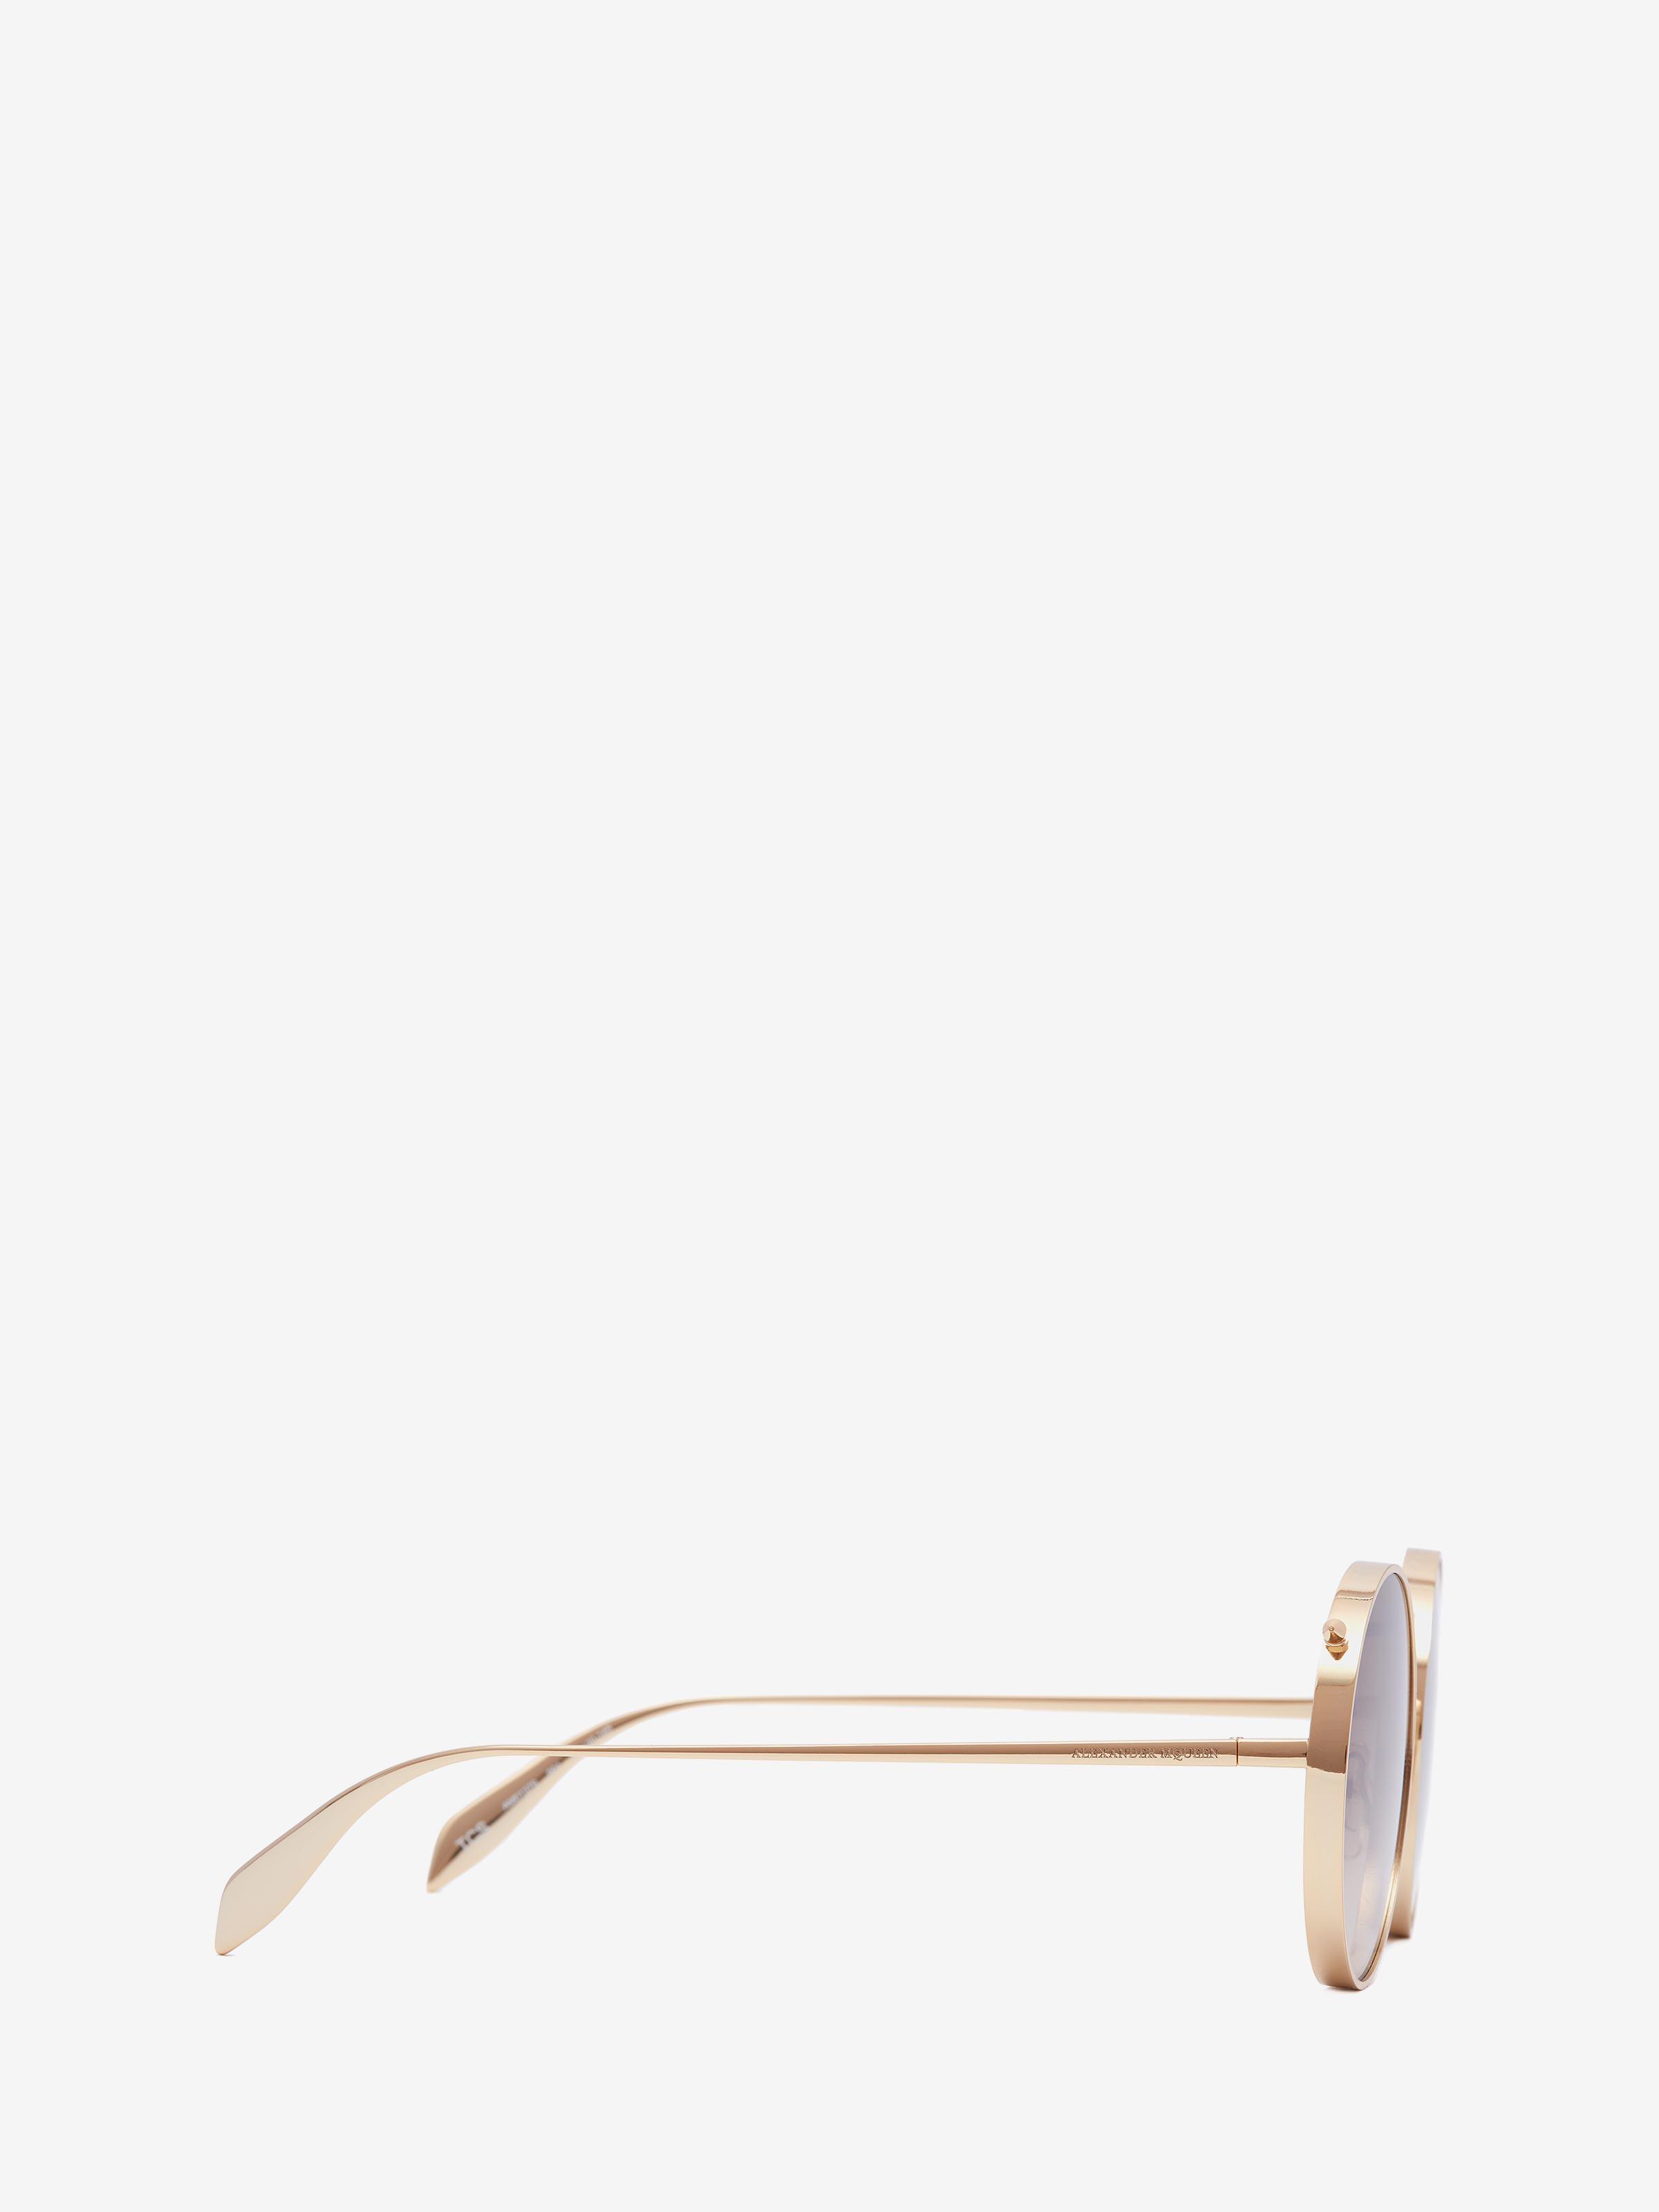 fed4b79bc6cf Alexander McQueen Metal Piercing Frame at £295   love the brands